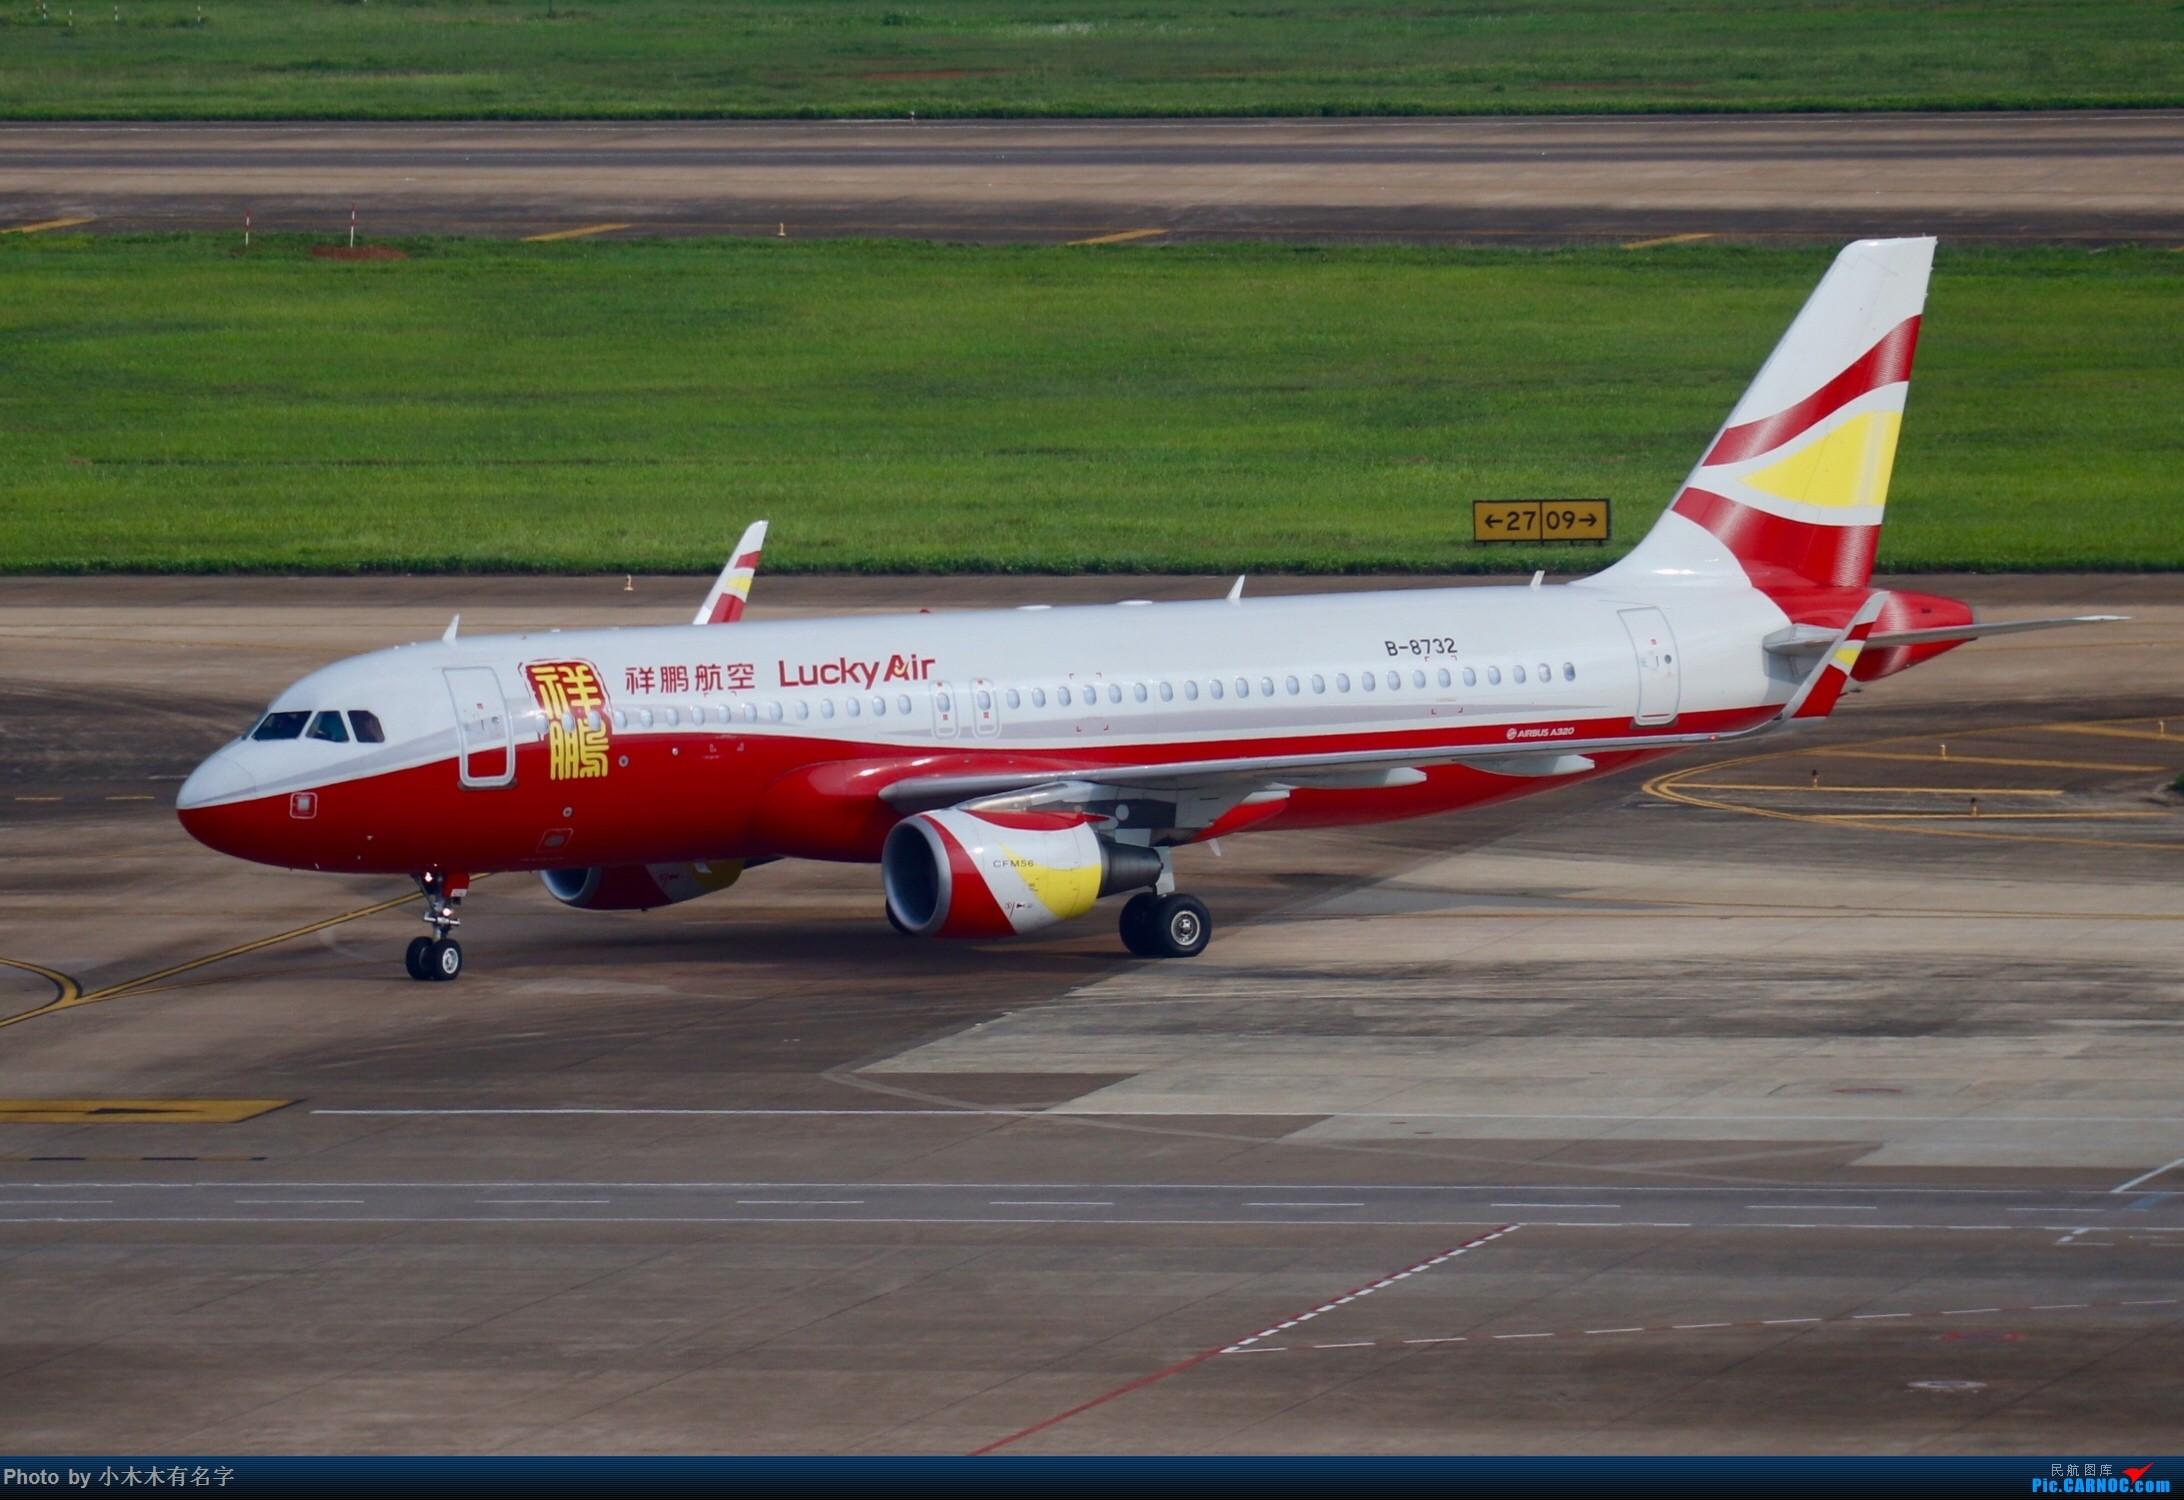 Re:[原创]海口美兰的另一个视角 AIRBUS A320-200 B-8732 中国海口美兰国际机场